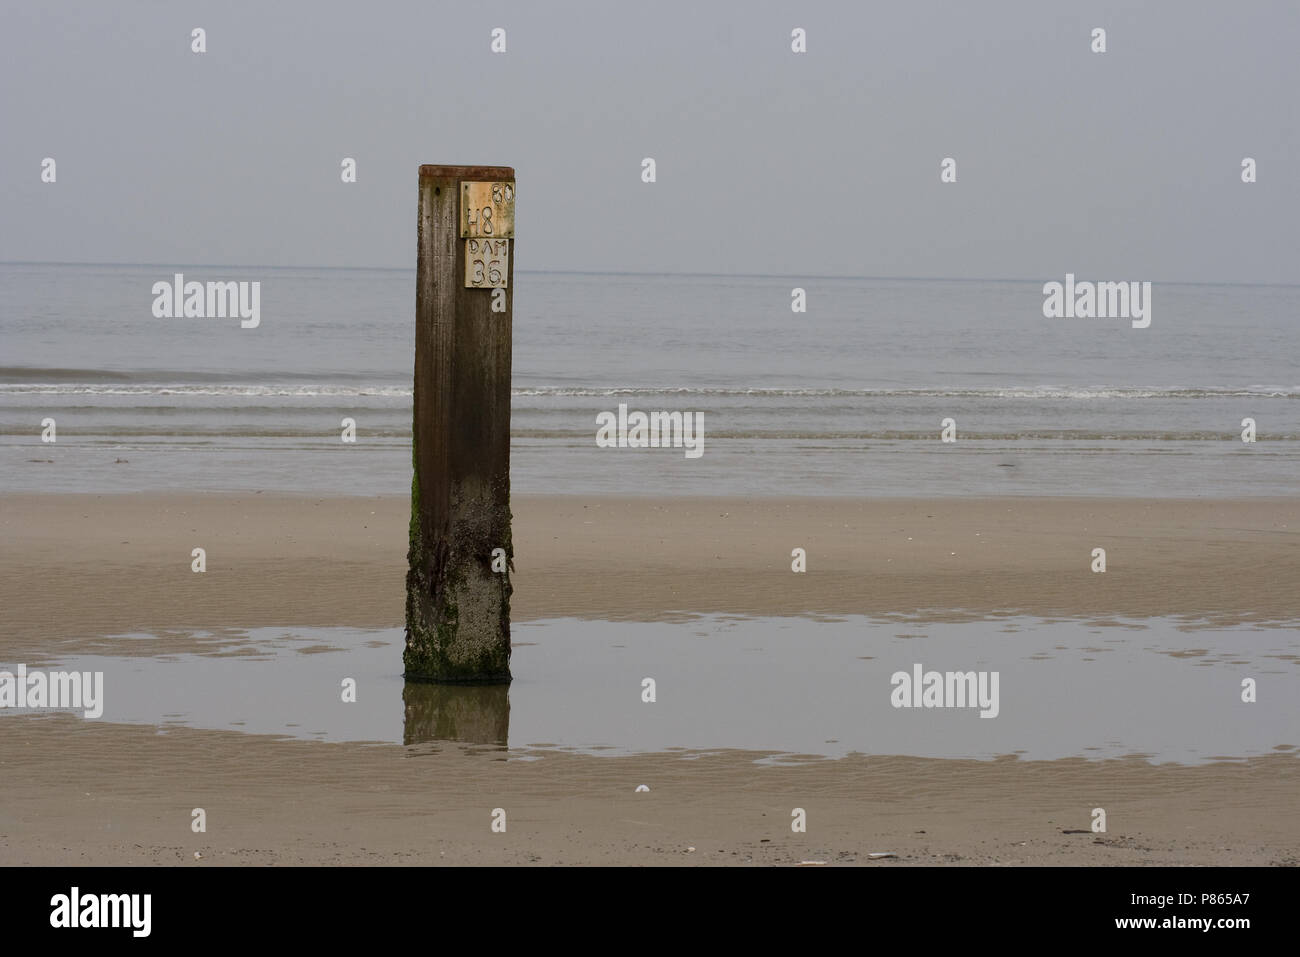 Paal op het strand van Vlieland; Pole on the beach of Vlieland Stock Photo